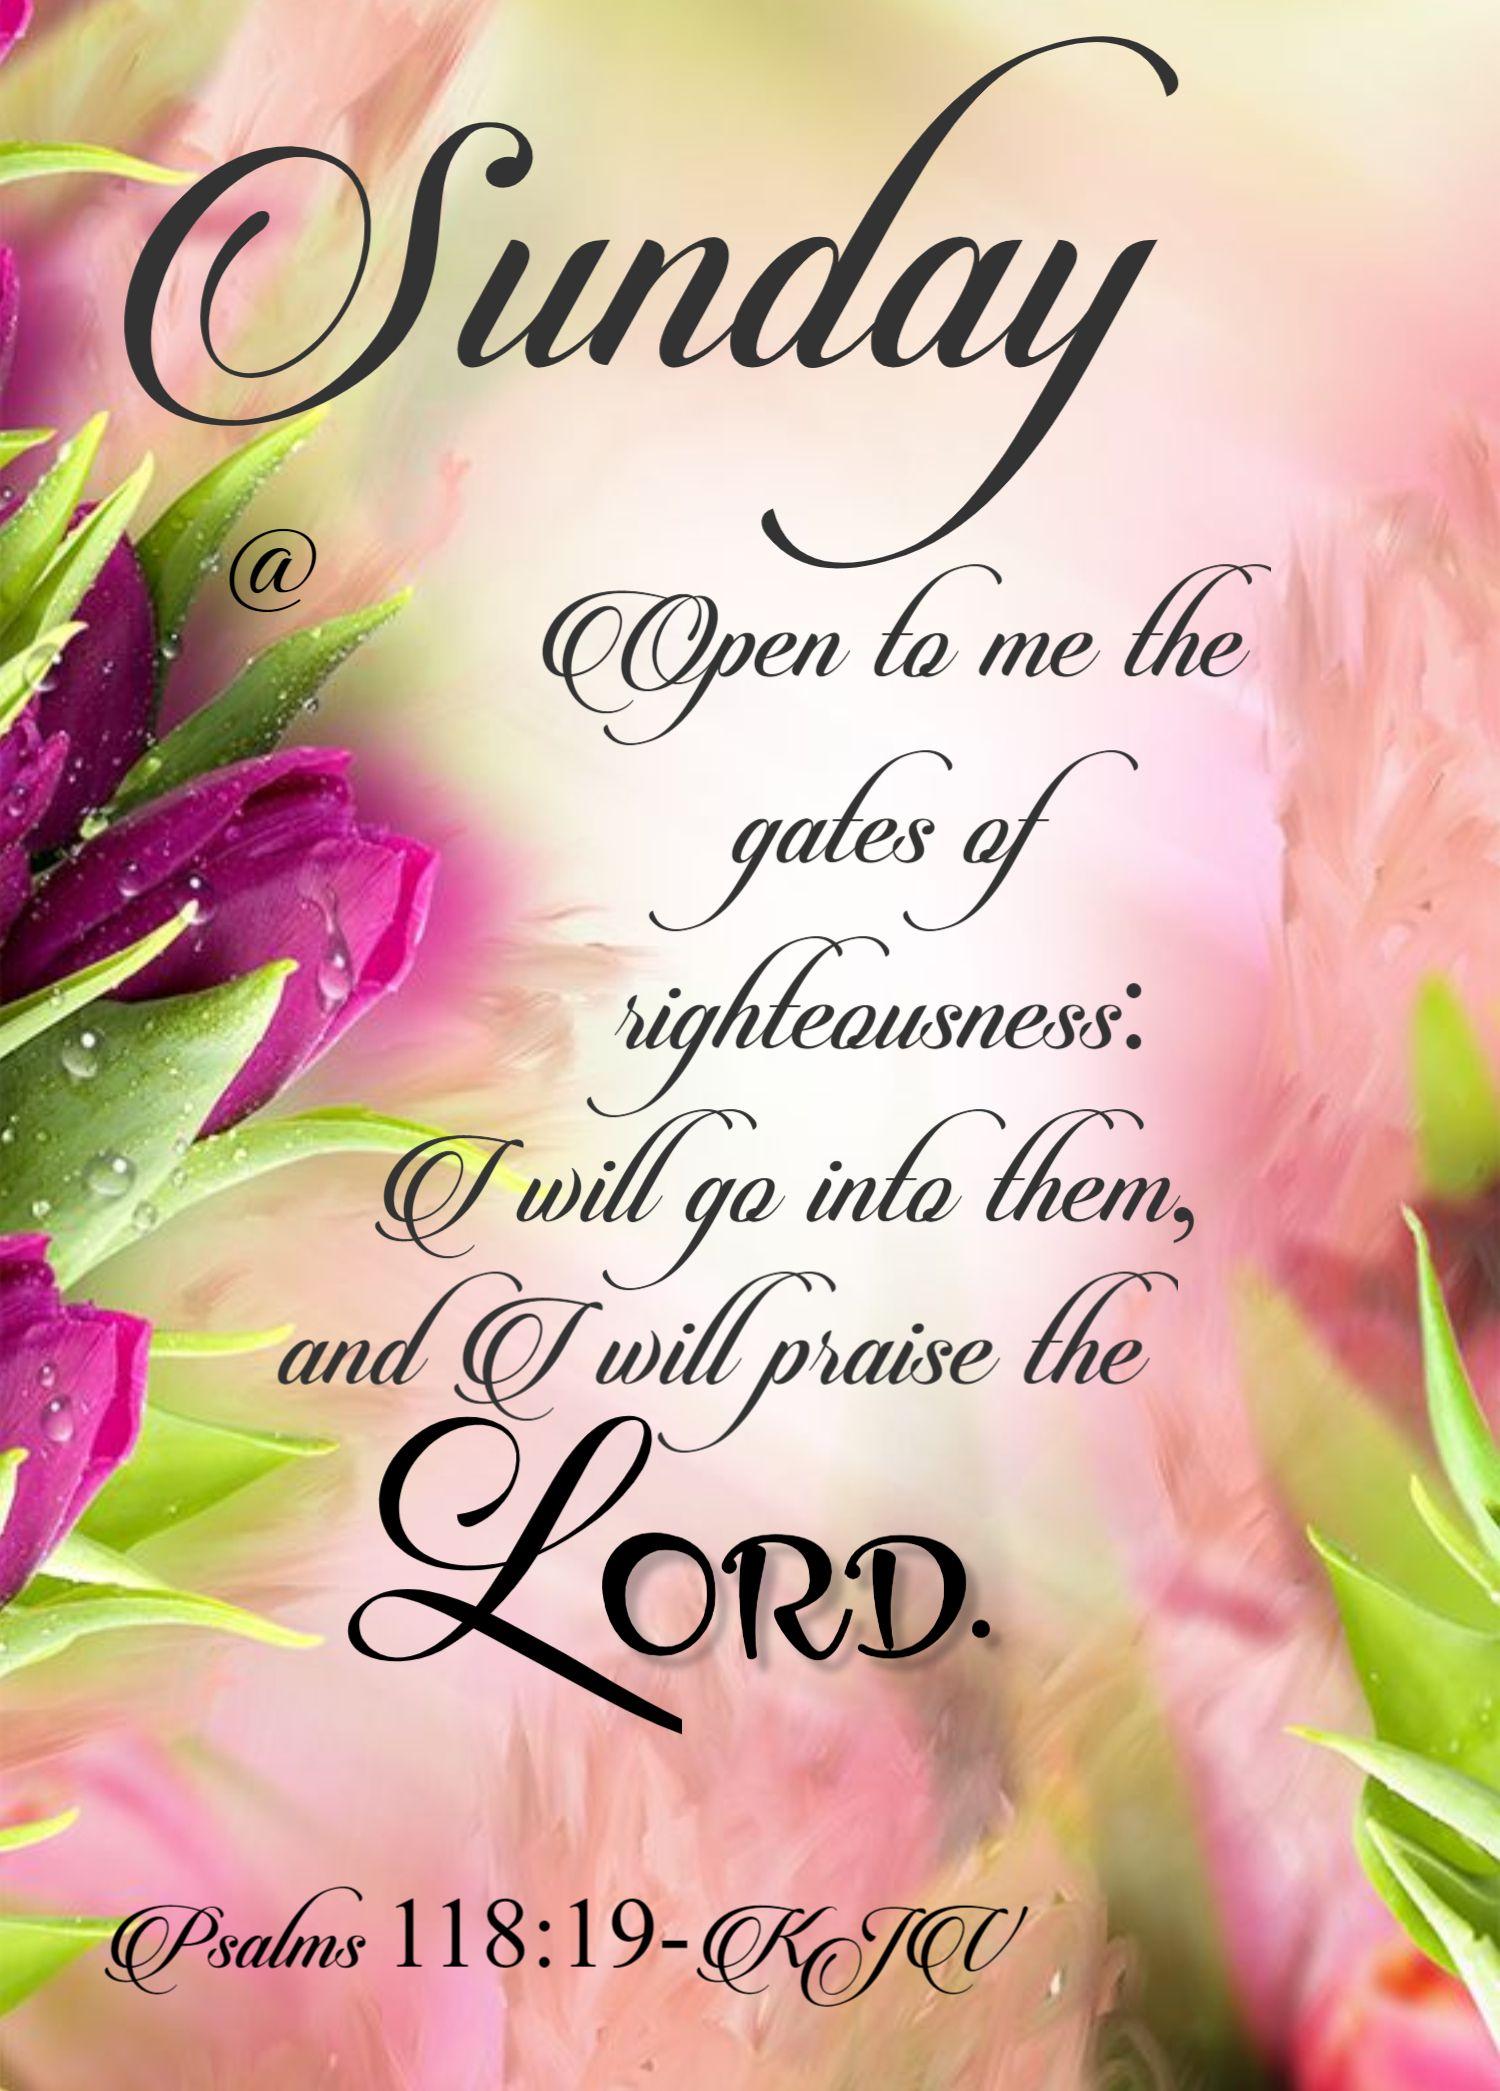 Sunday Blessings | Sunday church quotes, Sunday morning quotes, Good morning  happy sunday